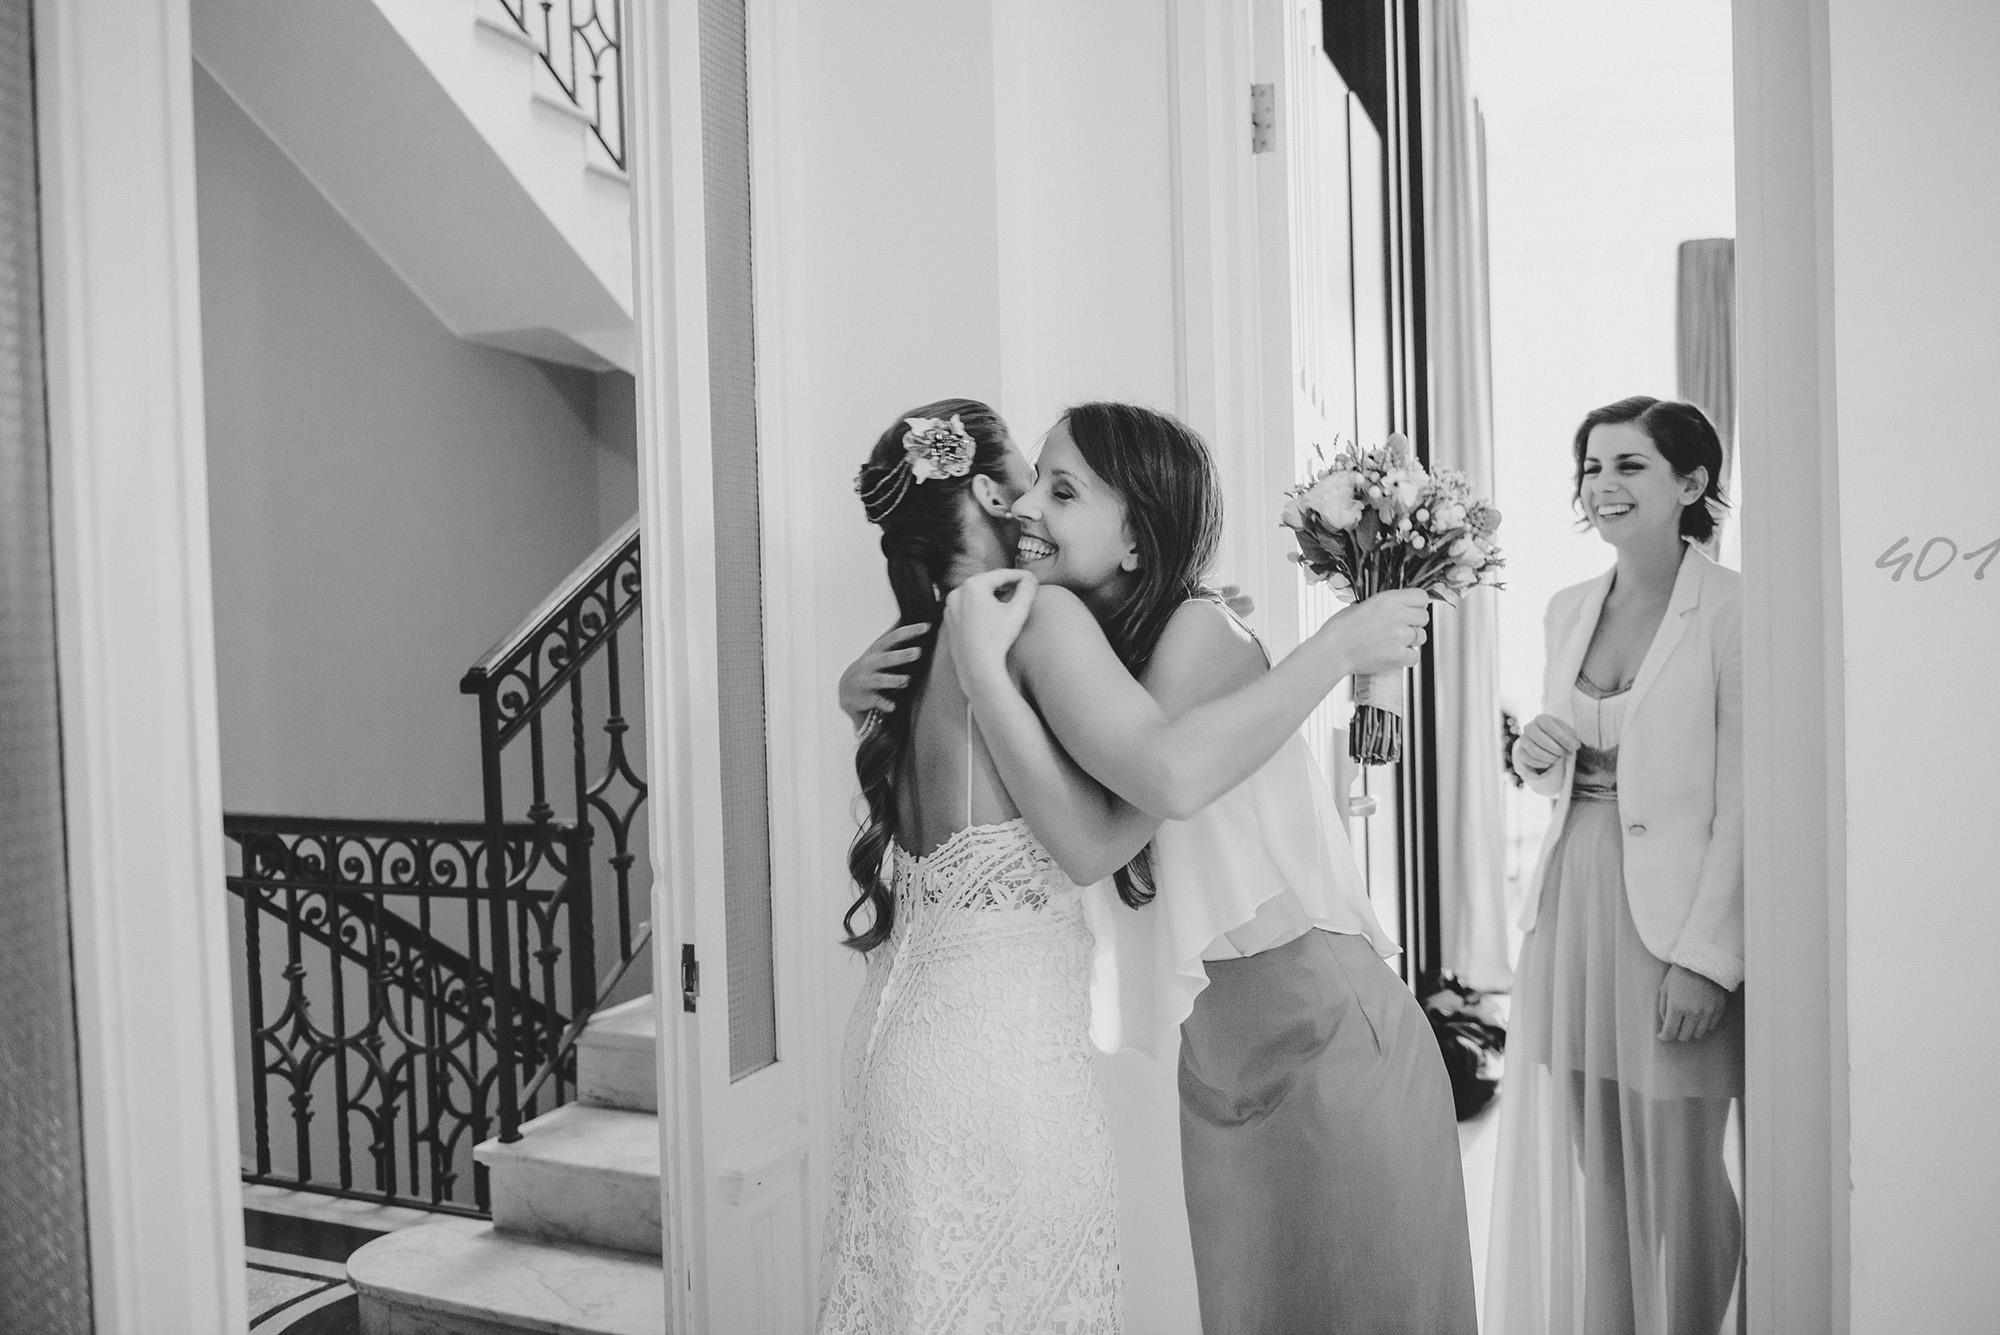 patricia-riba-casamiento-montevideo-uruguay-lindolfo-29